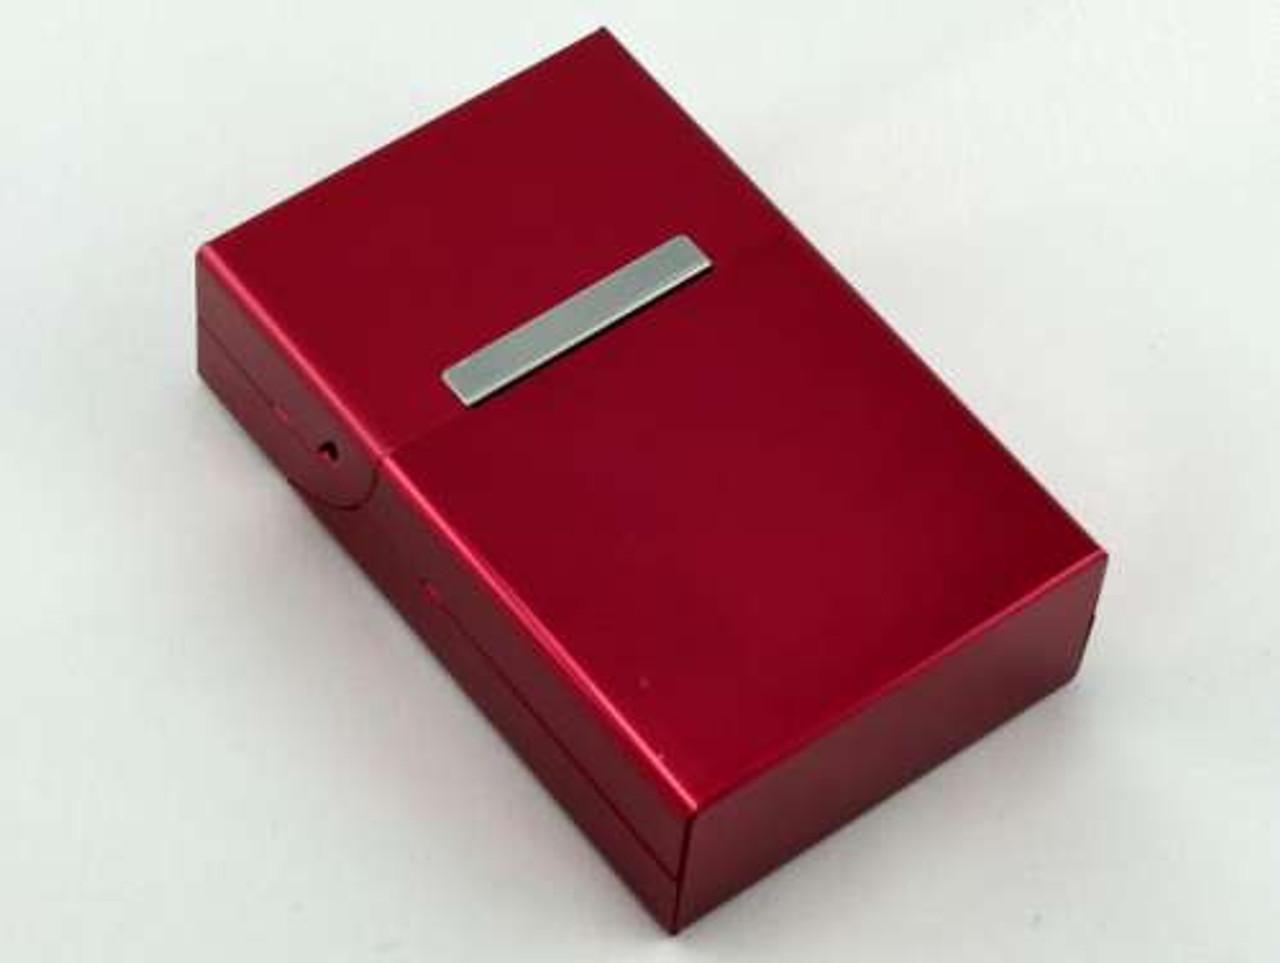 Red Sky Cigarette Pack Holder